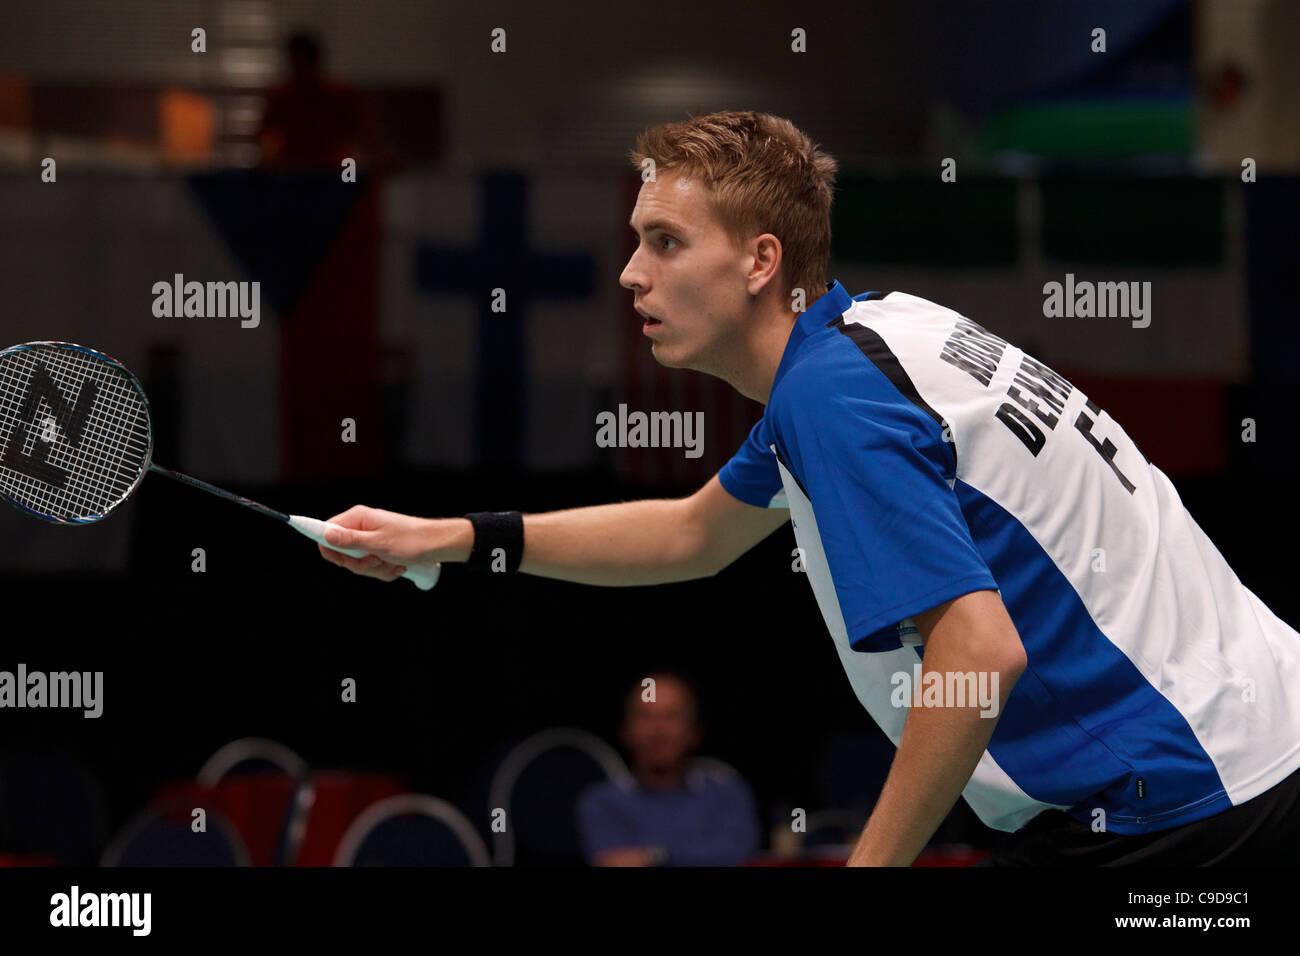 Badminton player Mads Pieler Kolding from Denmark Stock